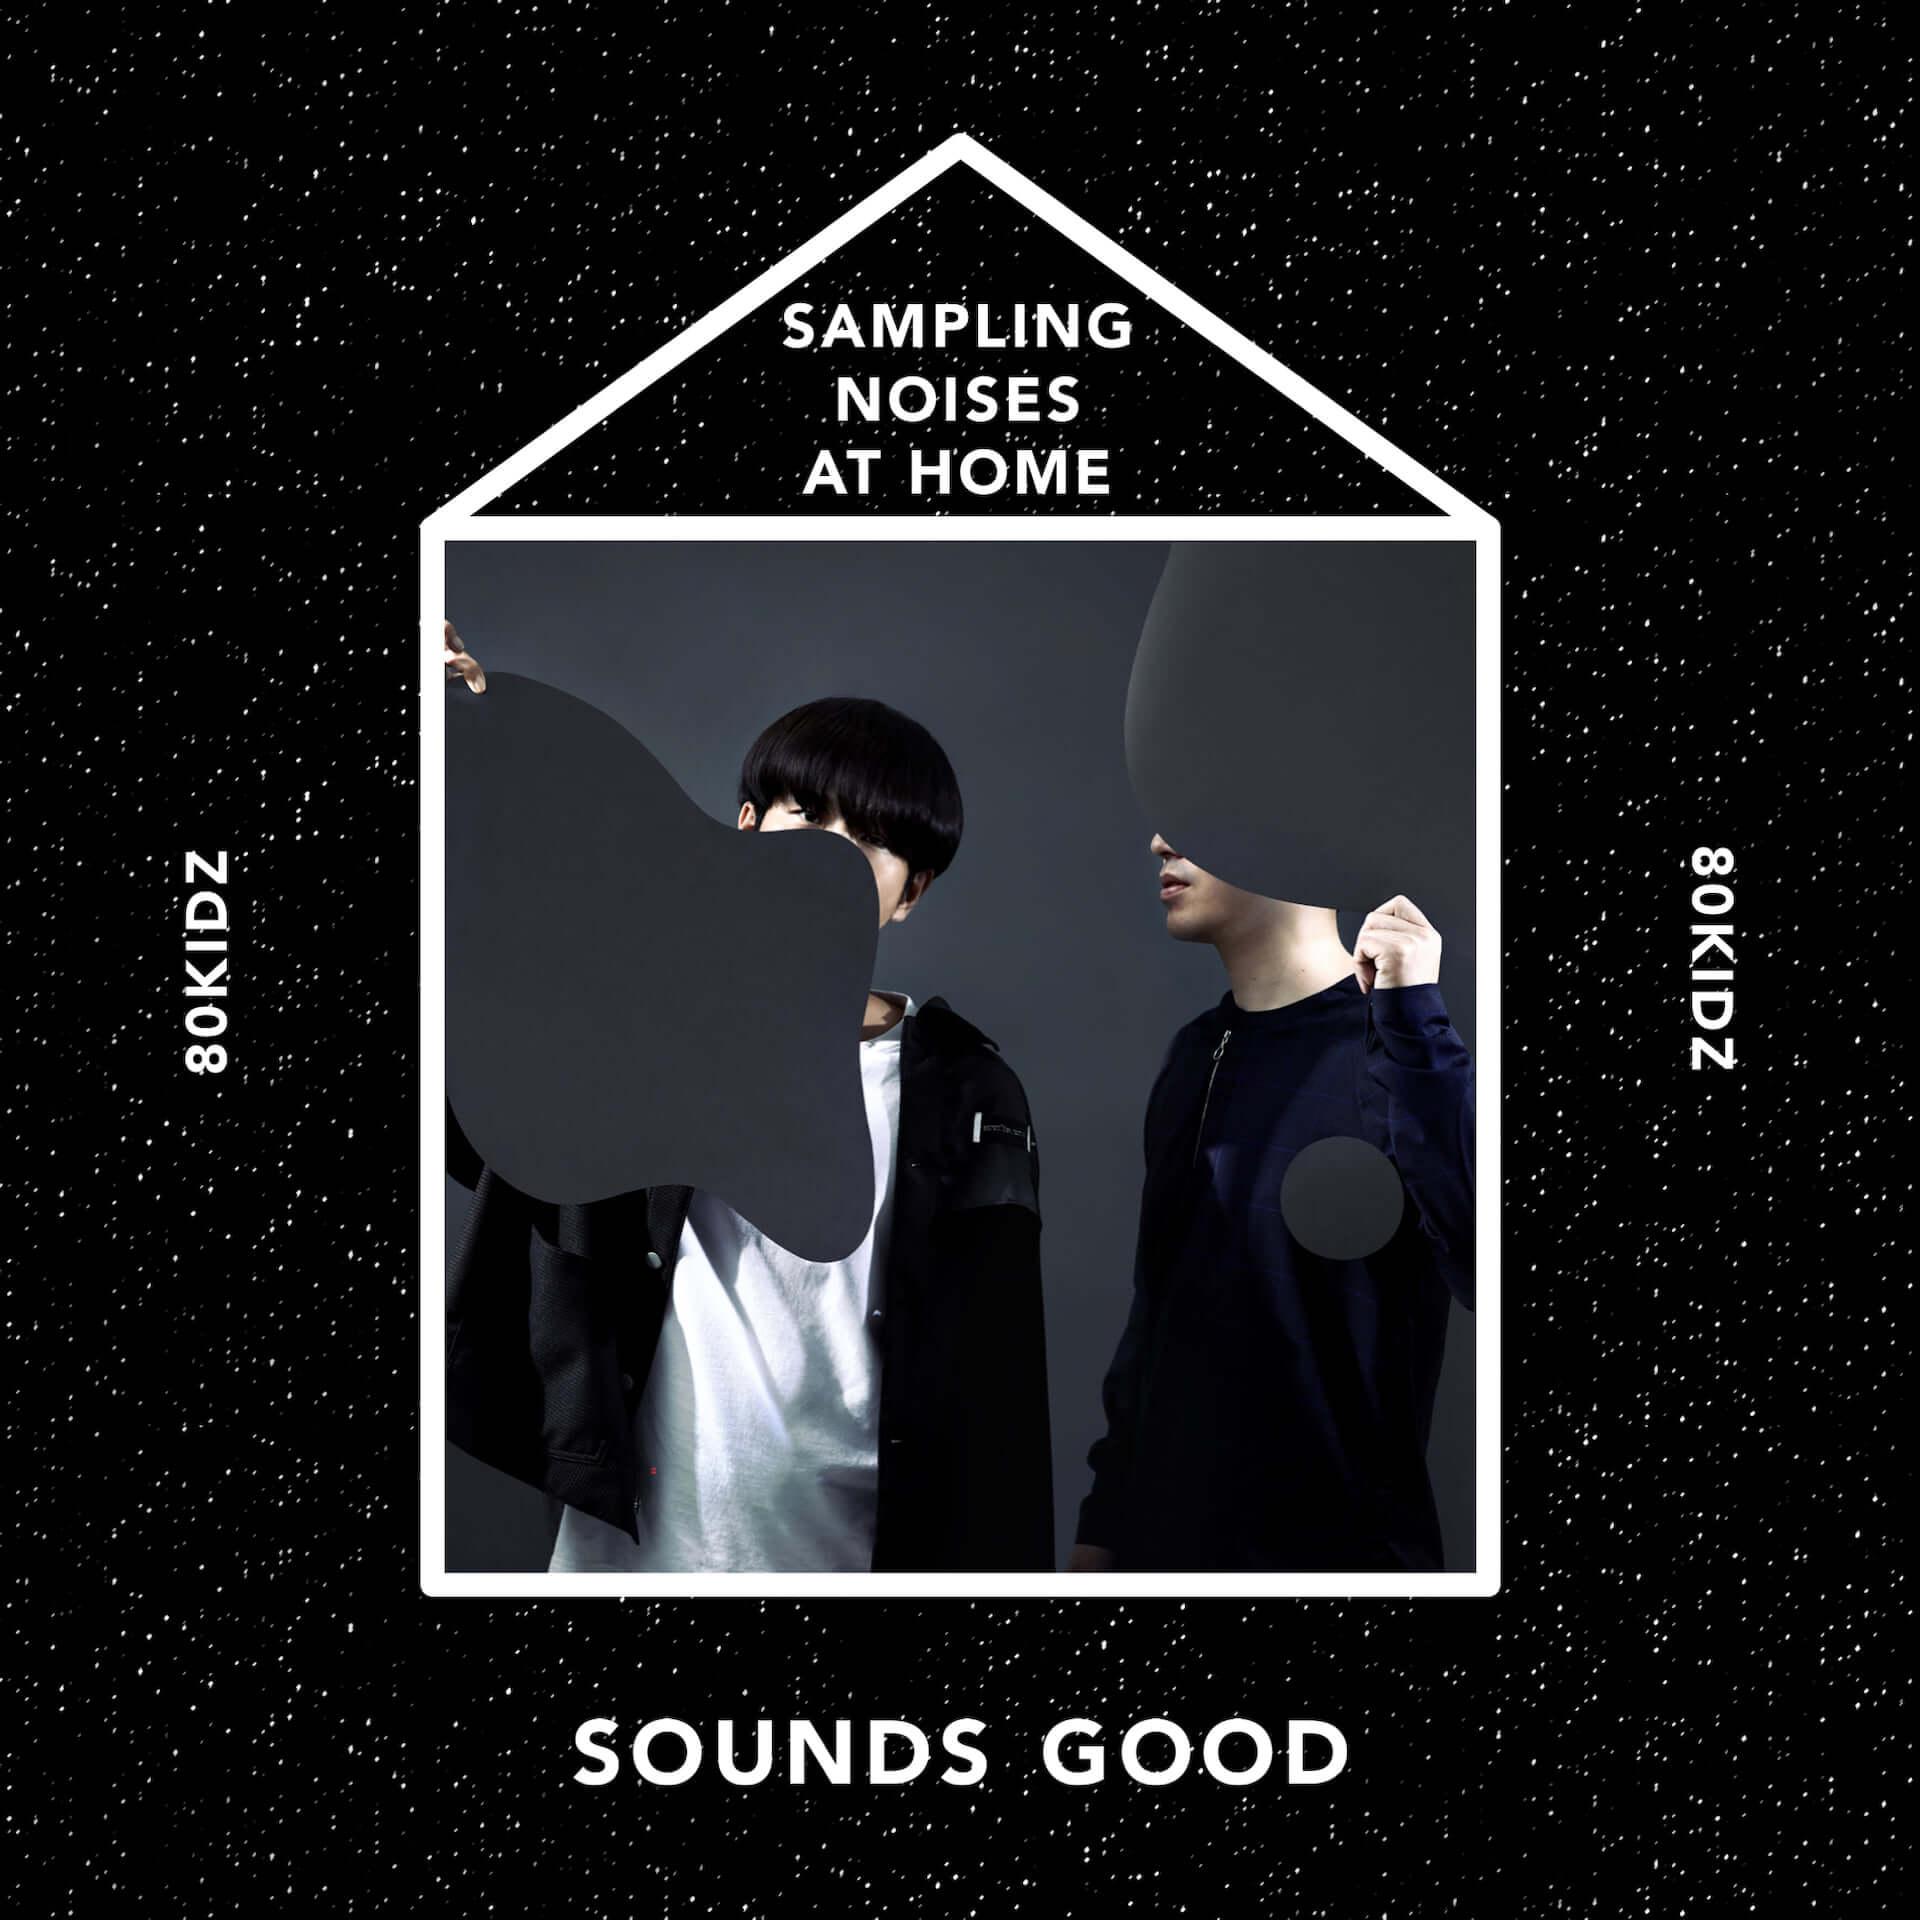 SOUNDS GOOD®とblock.fmによるコンピアルバムがリリース|80KIDZ、TAAR、Shin Sakiuraの楽曲が収録 music200603_feelsoundsgood_3-1920x1920